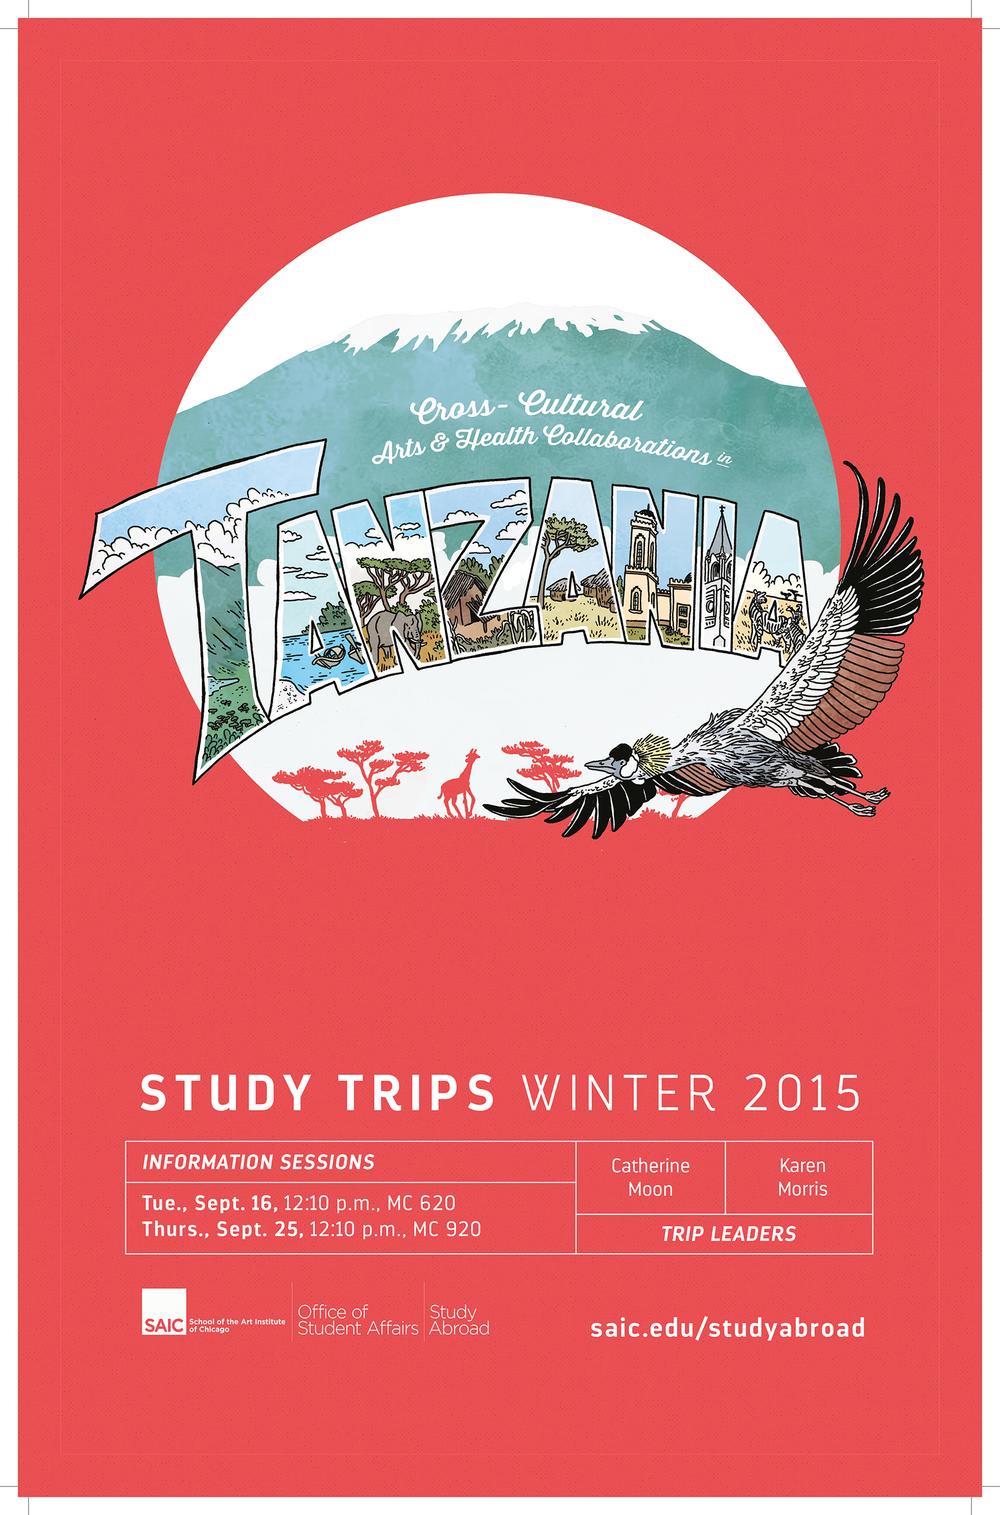 StudyTripWinter2015 6_small.jpg